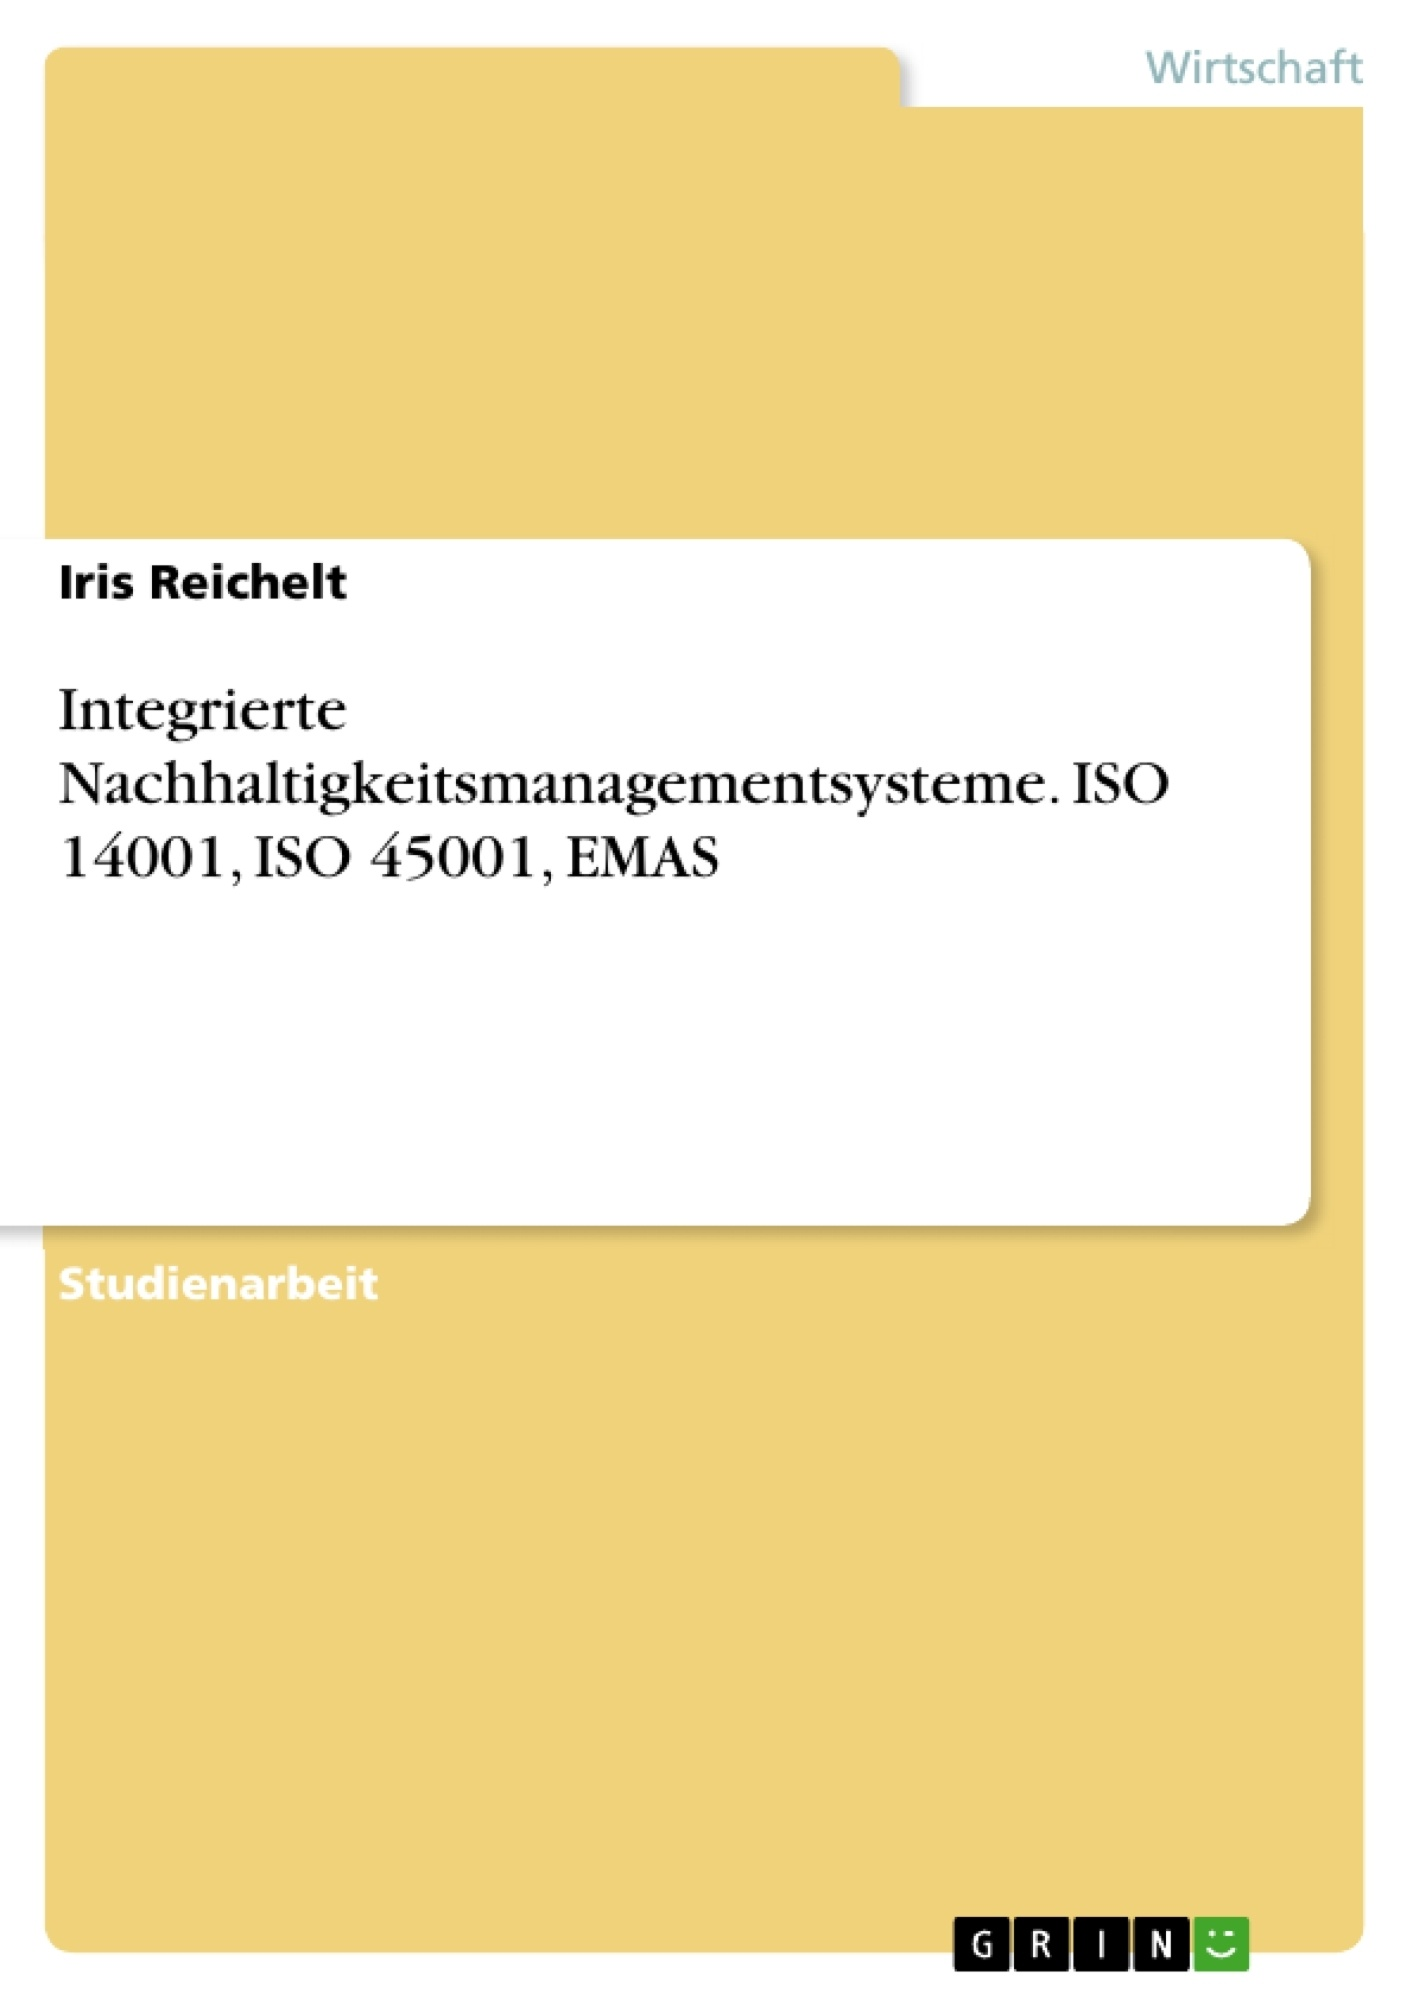 Titel: Integrierte Nachhaltigkeitsmanagementsysteme. ISO 14001, ISO 45001, EMAS